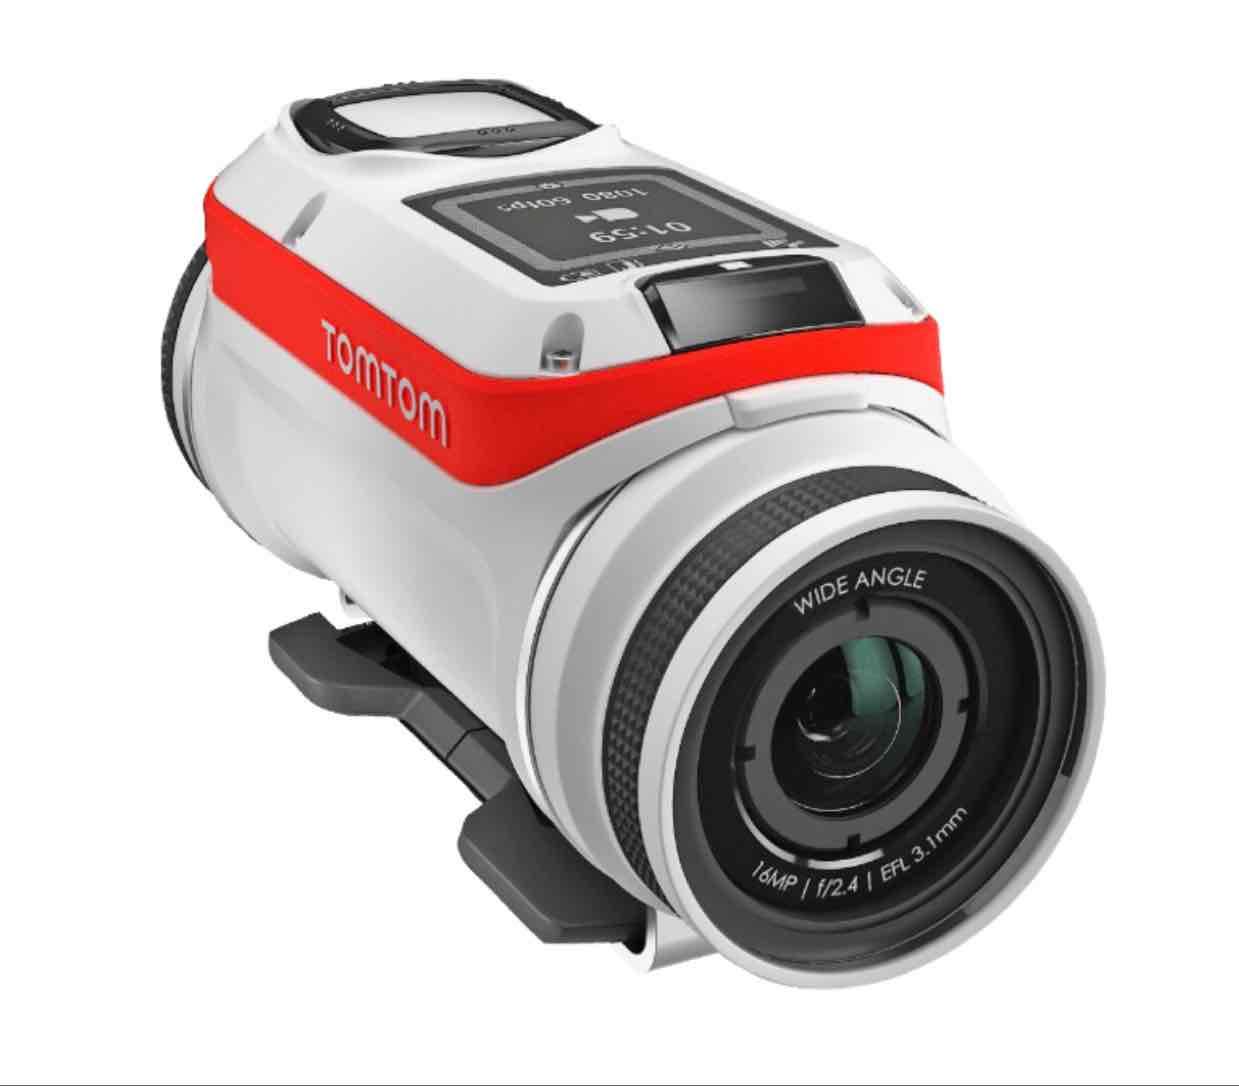 [ Media Markt ] TOMTOM 1LB0.001.02 Bandit Adventure Pack Kamera !